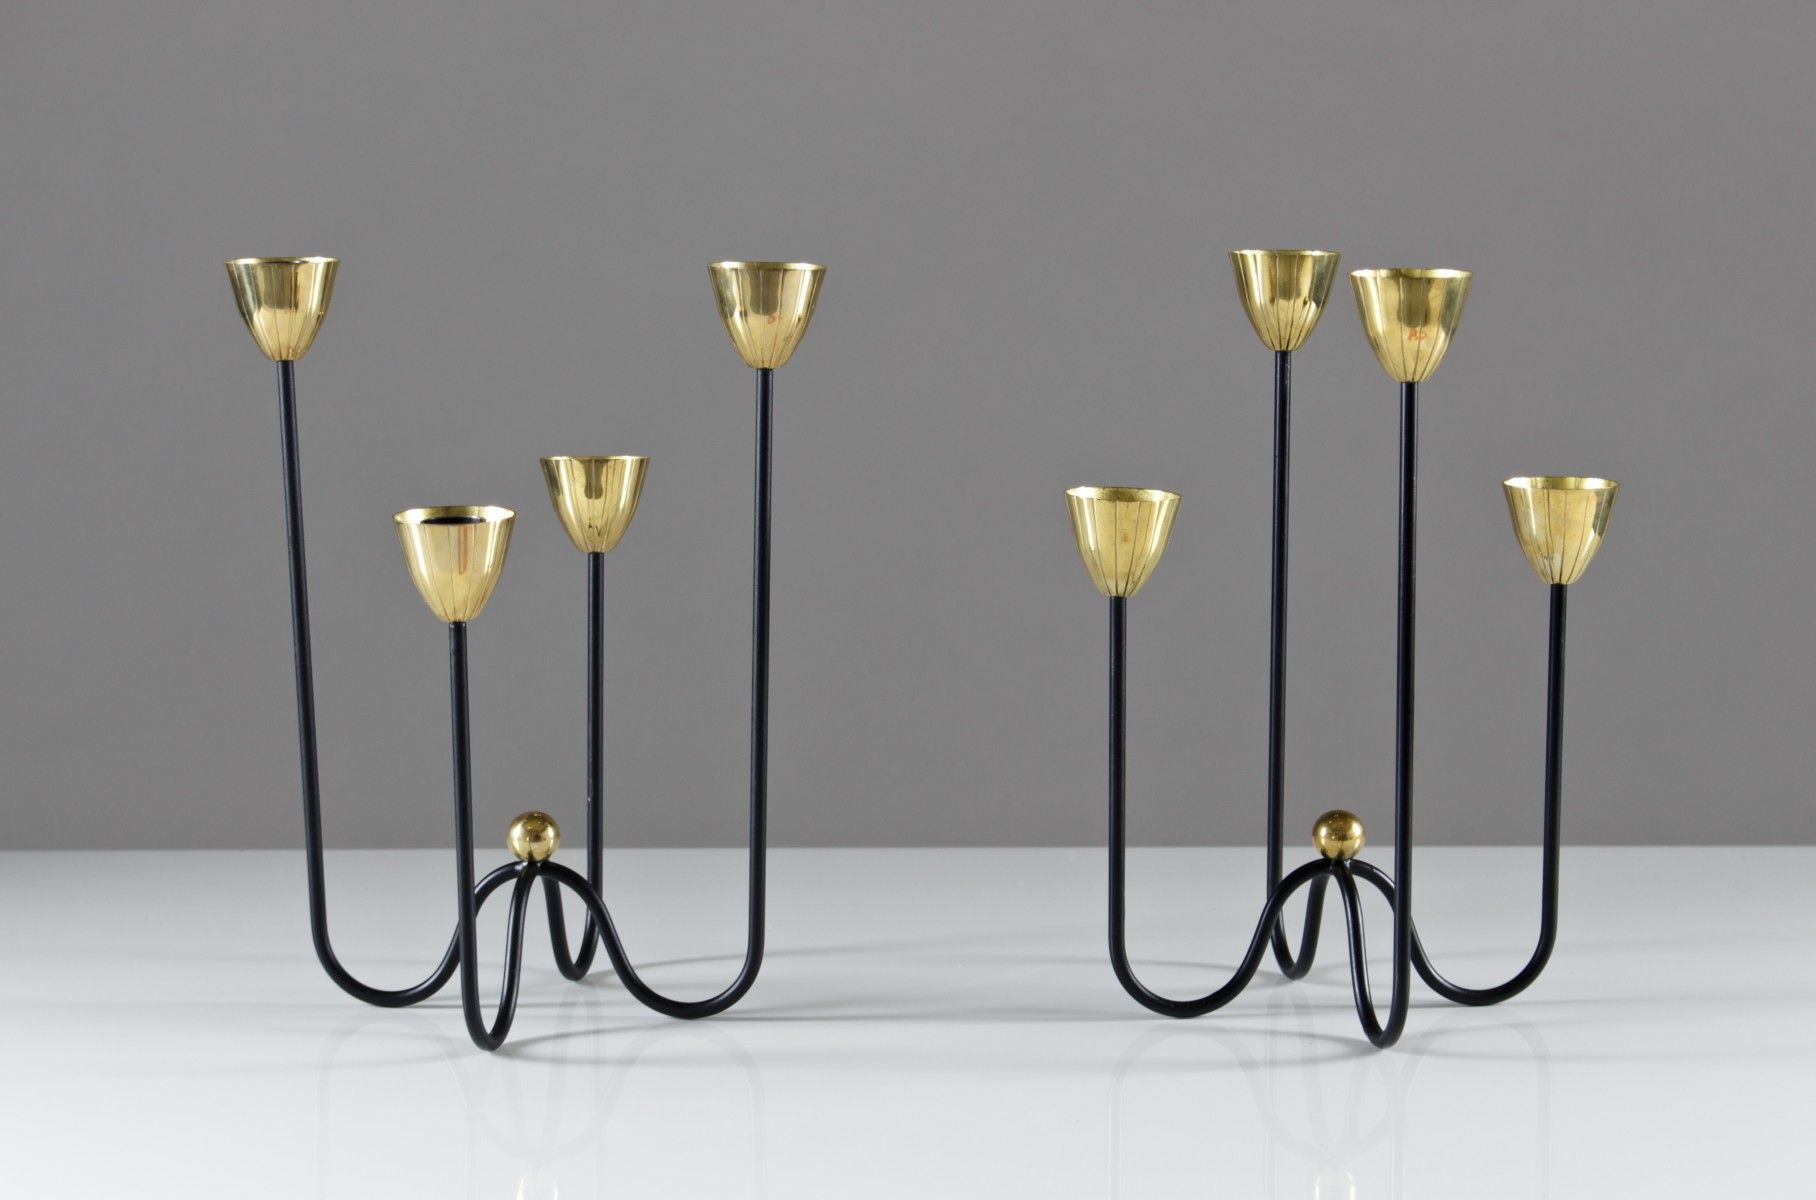 Candelabras by gunnar ander for ystad metall set of pinterest